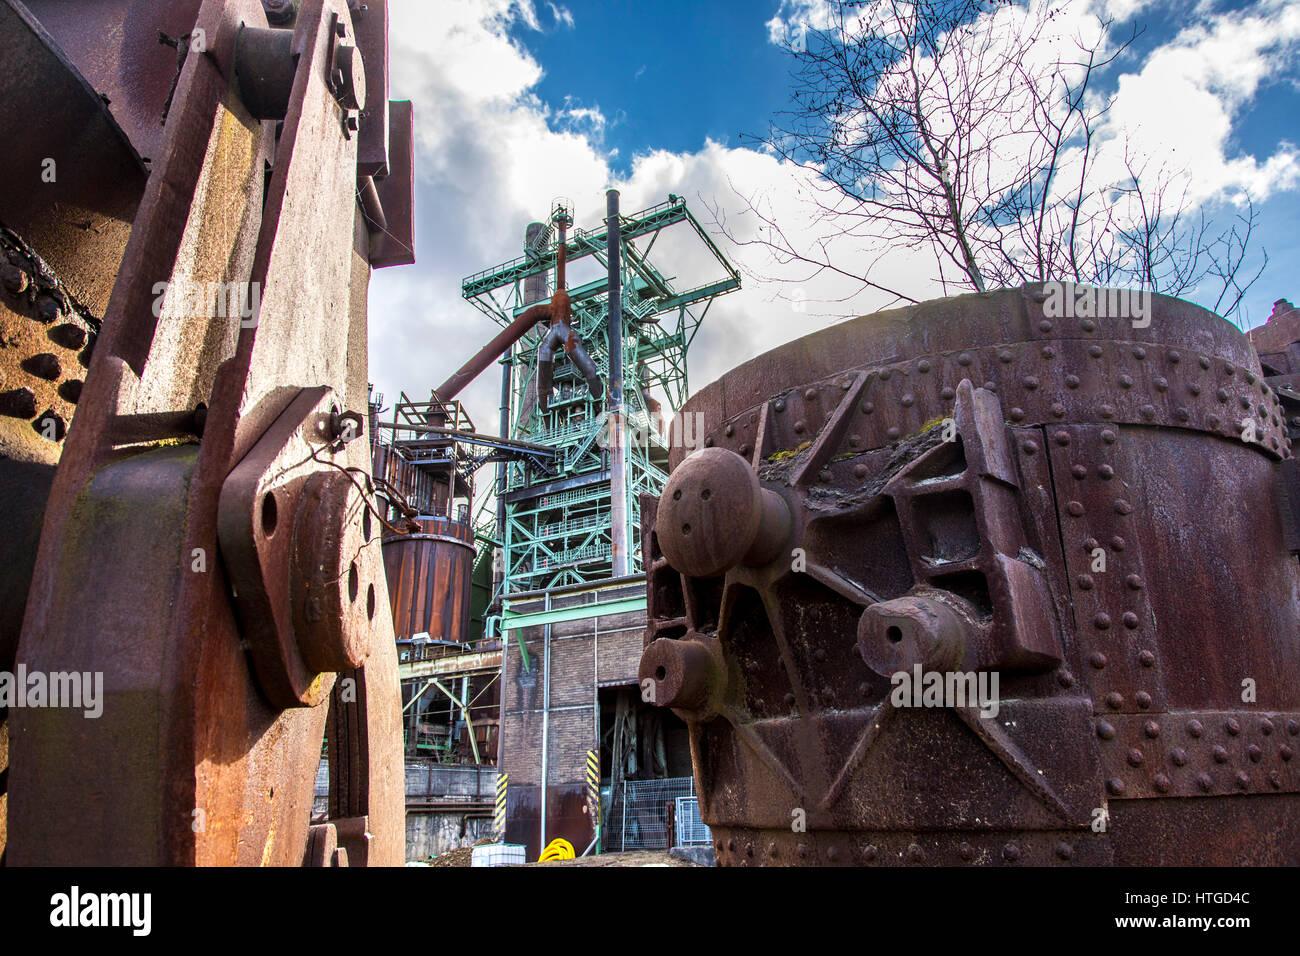 Henrichshütte, former steelworks, industrial museum, Hattingen, Germany, - Stock Image